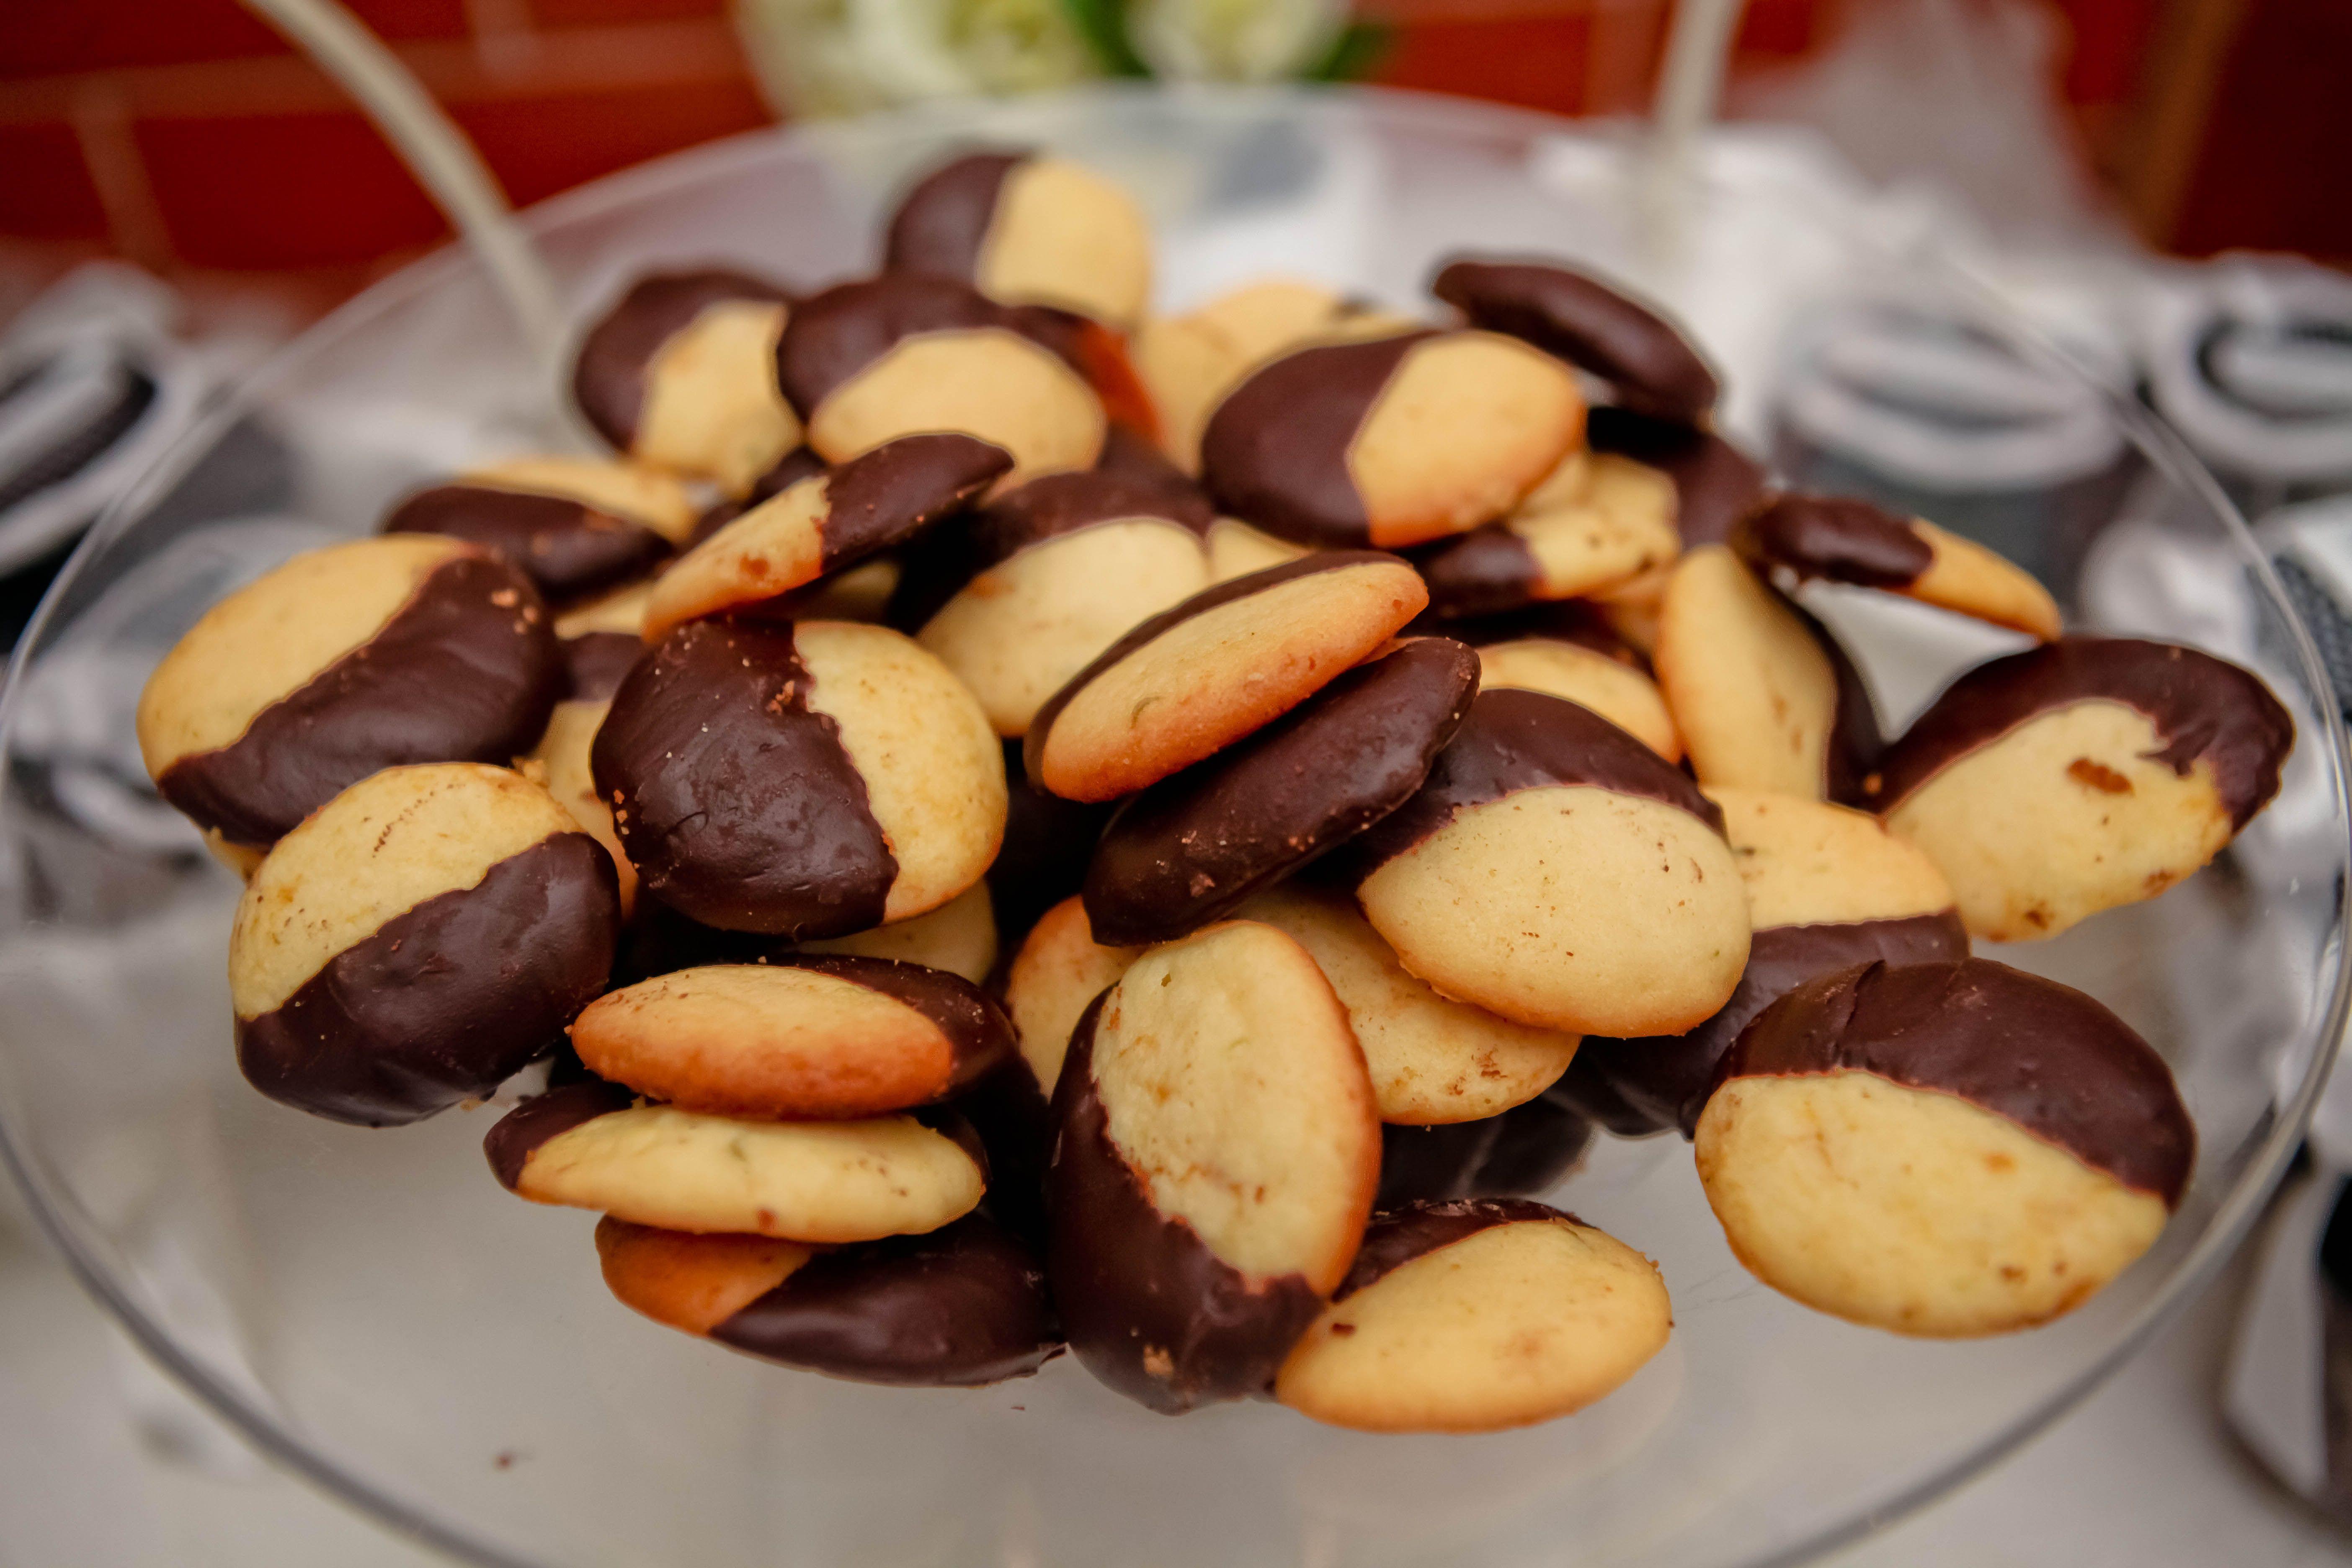 Biscoito dois amores